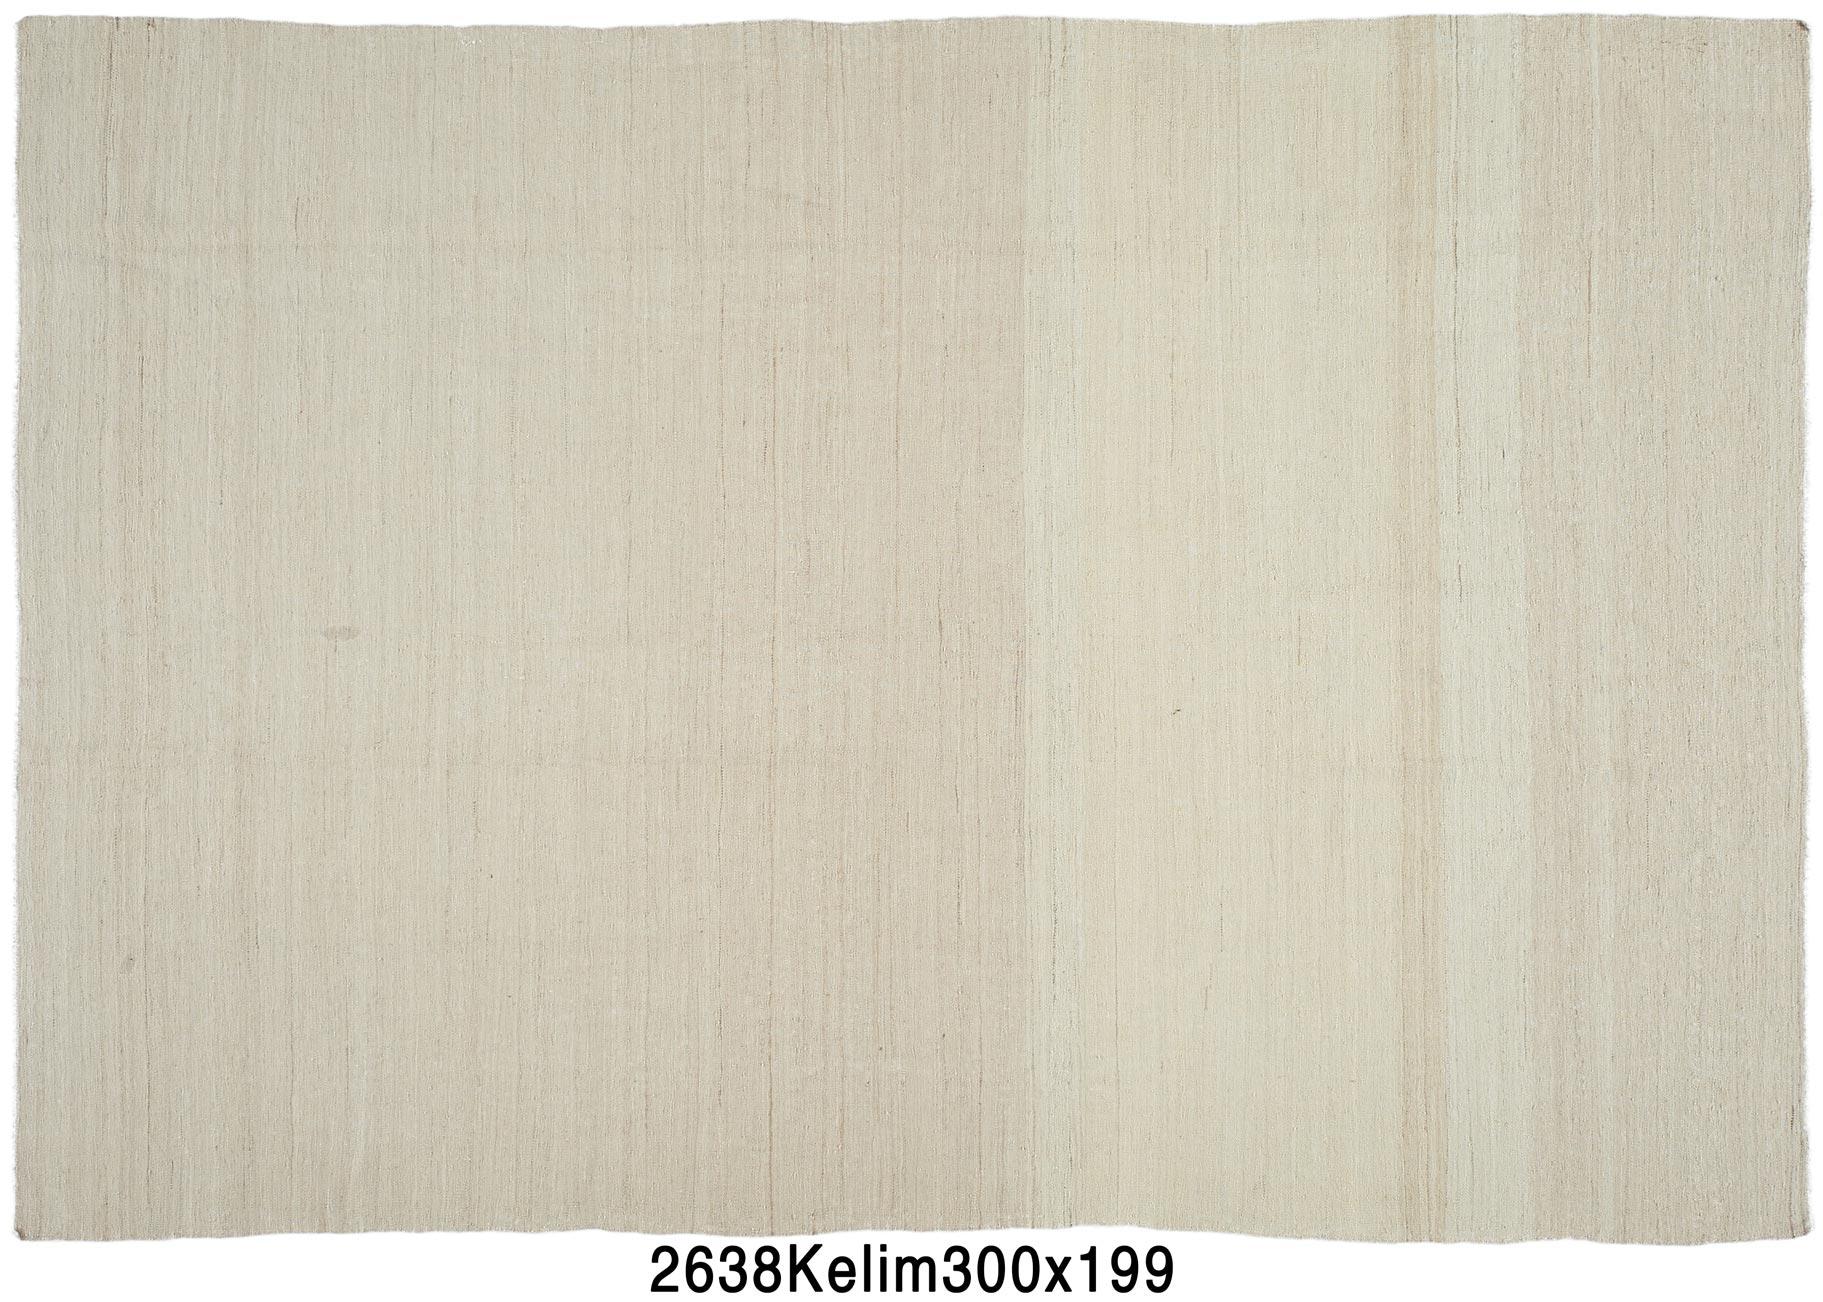 2638 kelim 300x199 ariana rugs. Black Bedroom Furniture Sets. Home Design Ideas